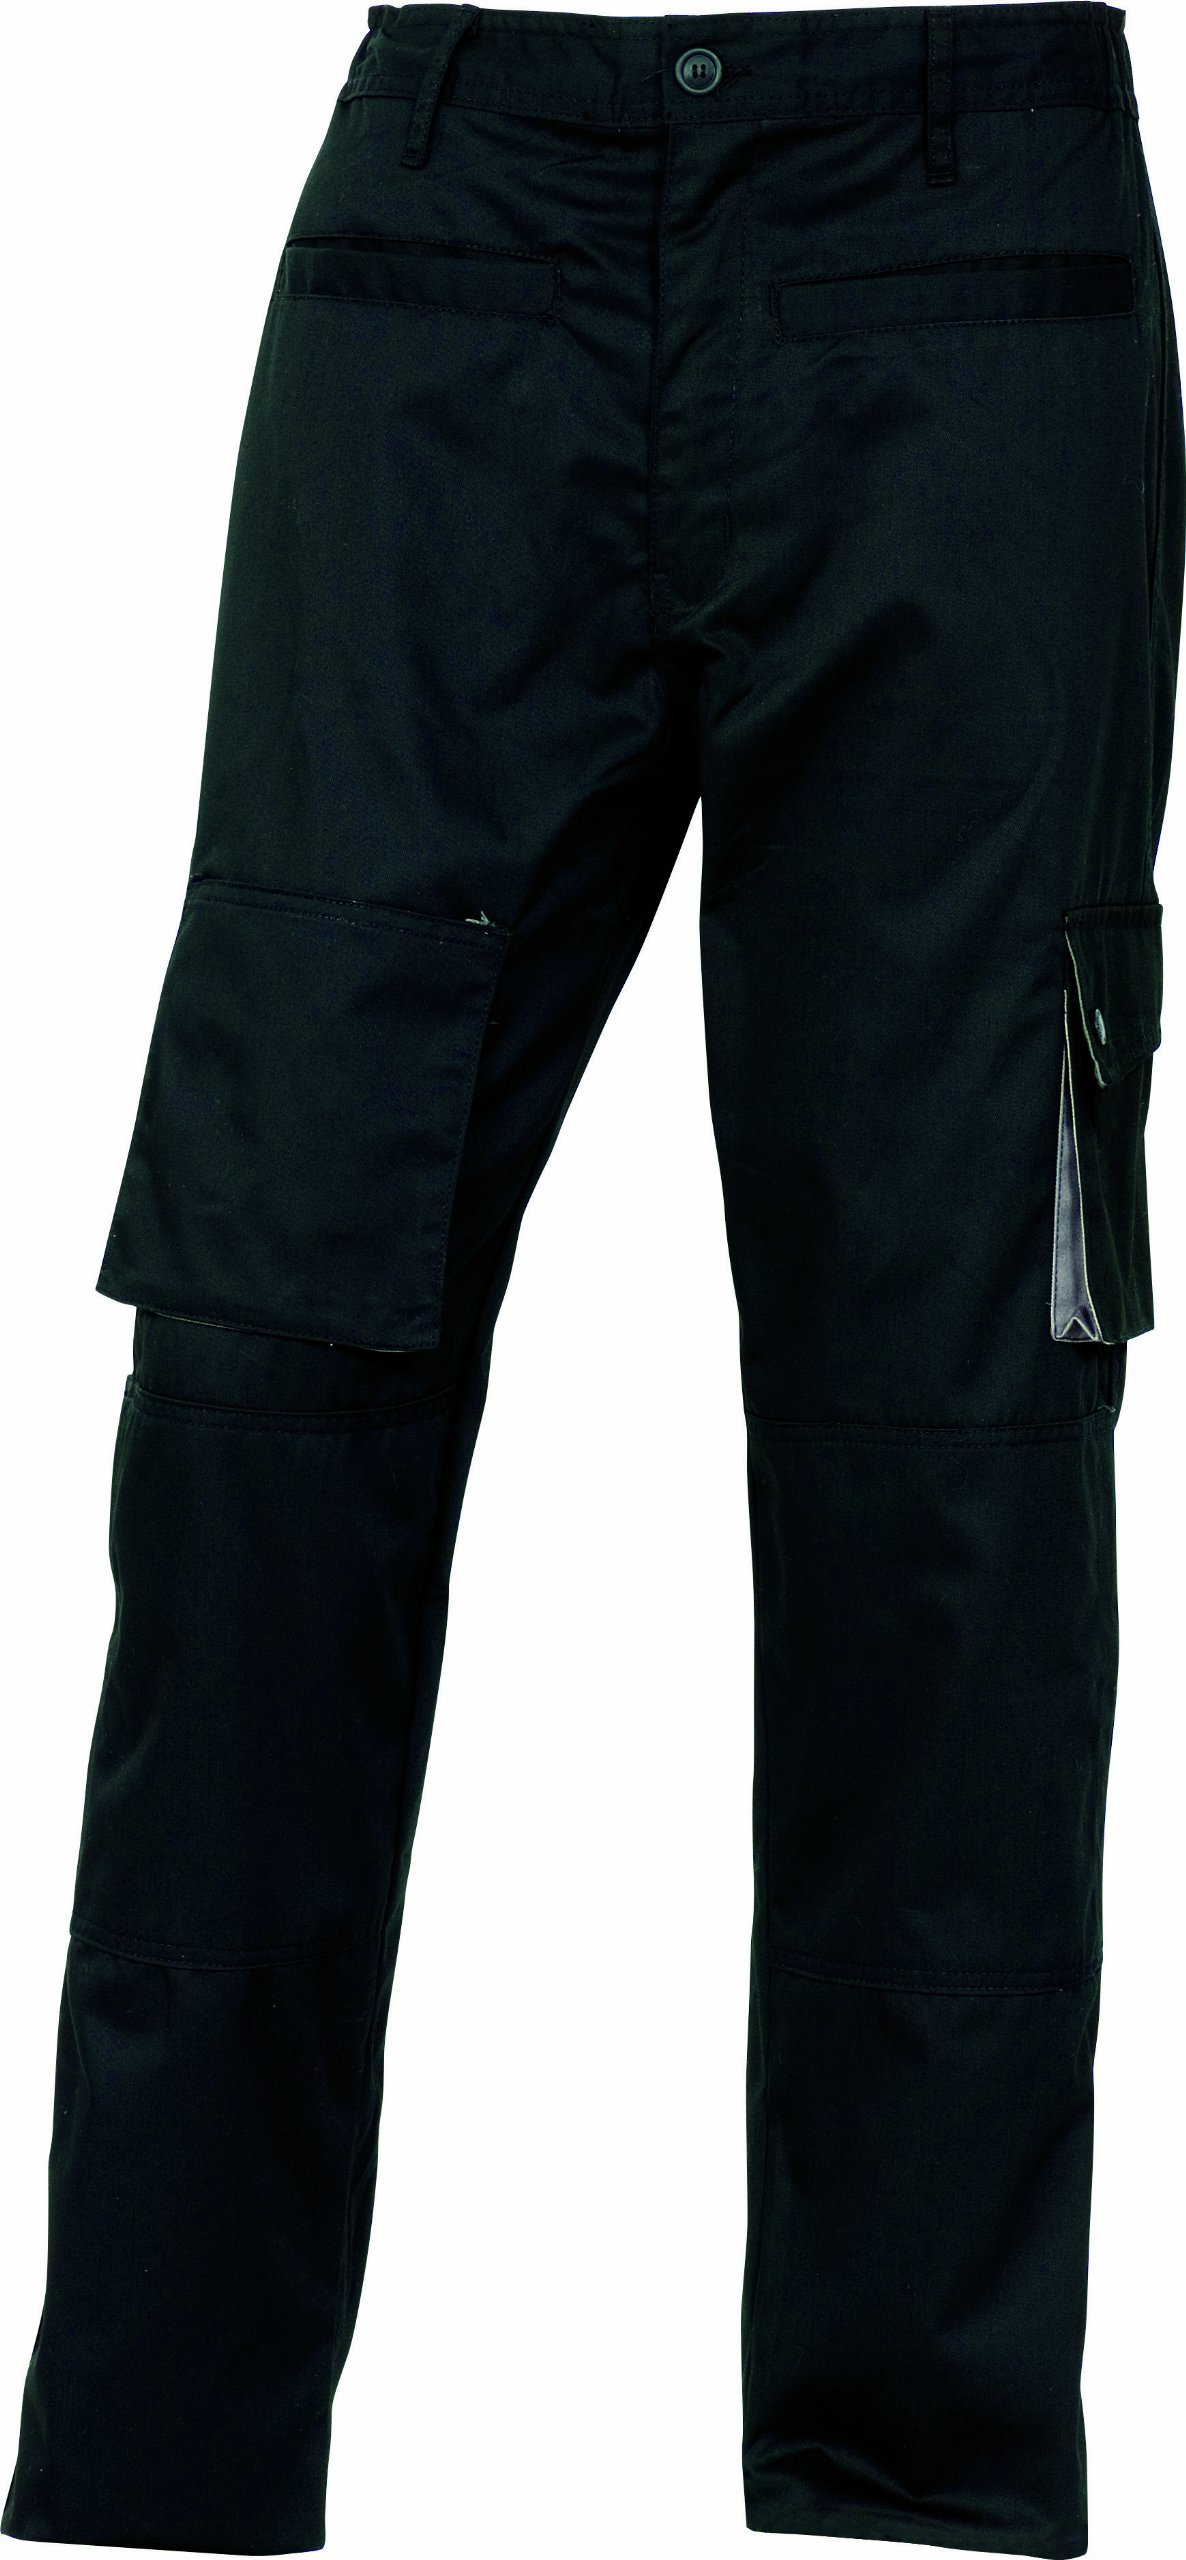 Panoply Men's Mach2 Black Winter Warm Lined Work Trousers Work Pants Medium Black with Grey trim